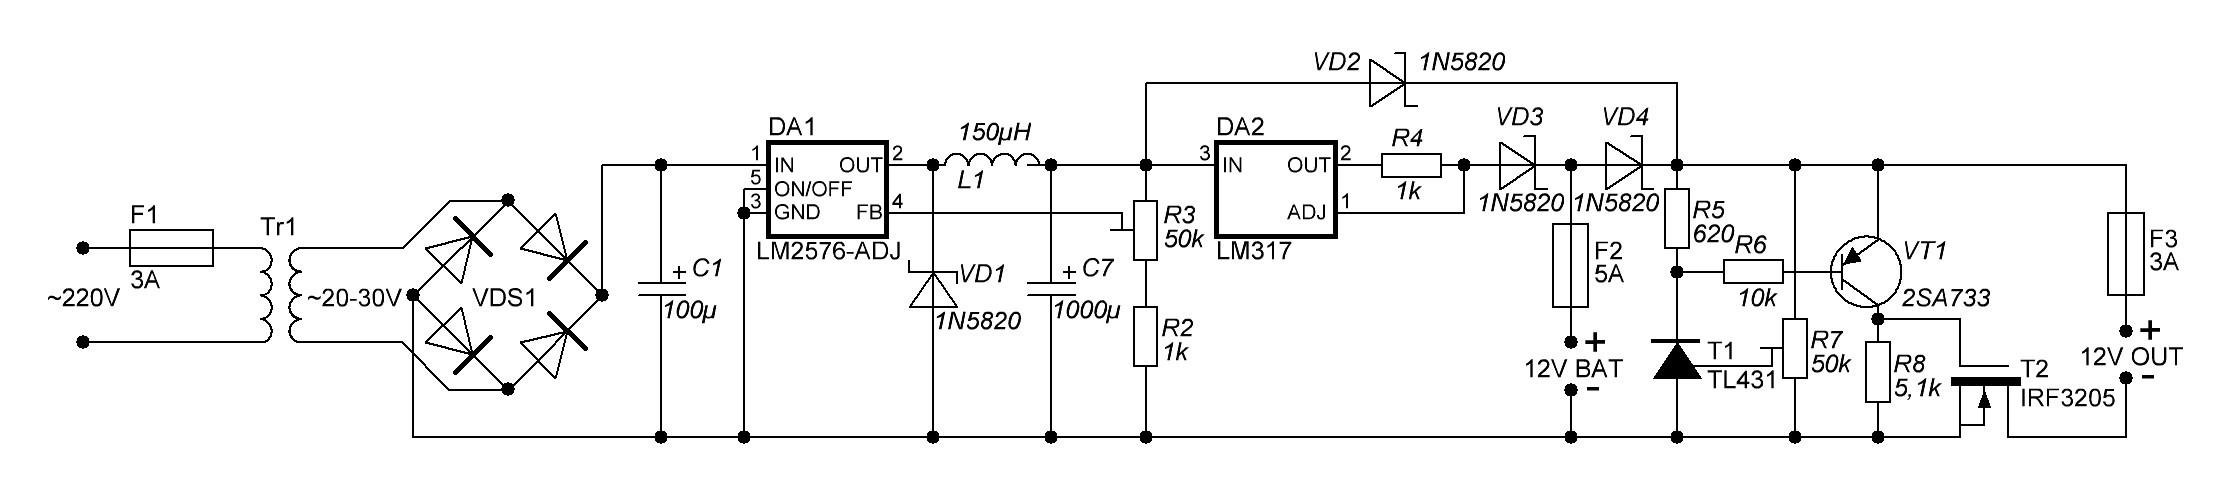 Зарядное устройство для акб 12v 10a схема